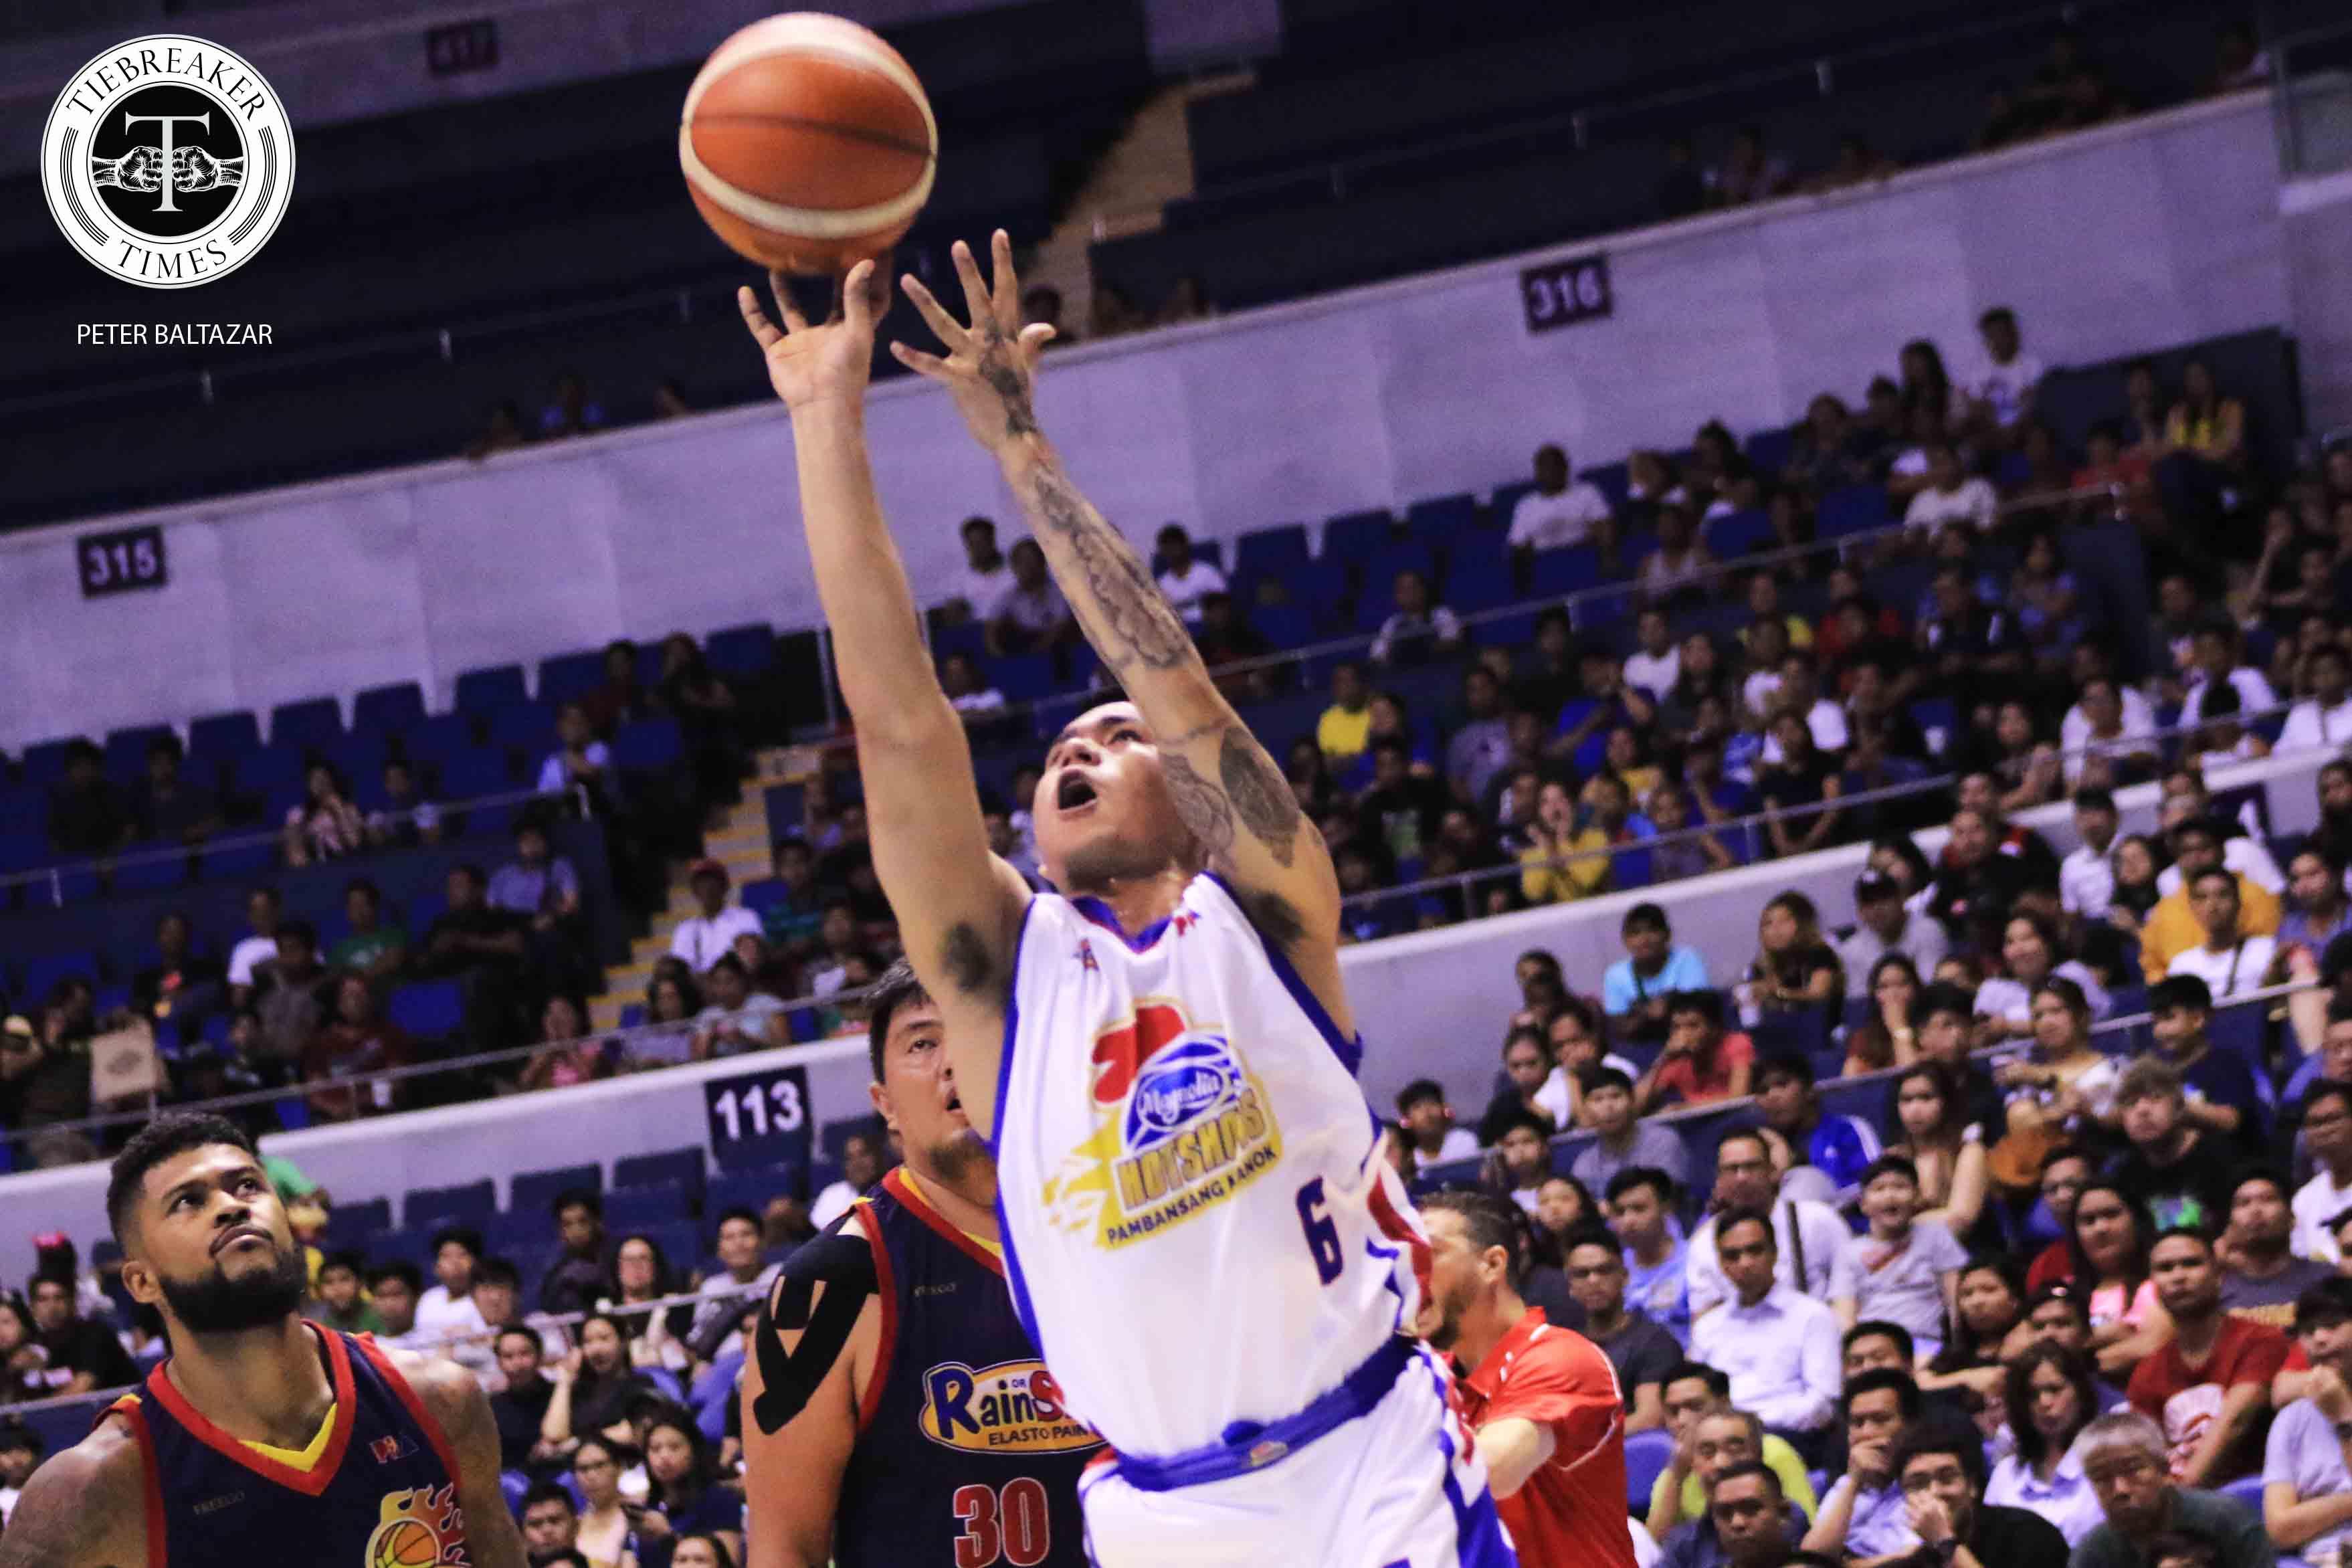 Tiebreaker Times Jio Jalalon on knocking down Game 4-saving FTs: 'Pag hindi na-shoot yun, yari ako' Basketball News PBA  PBA Season 44 Magnolia Hotshots Jio Jalalon 2019 PBA Philippine Cup